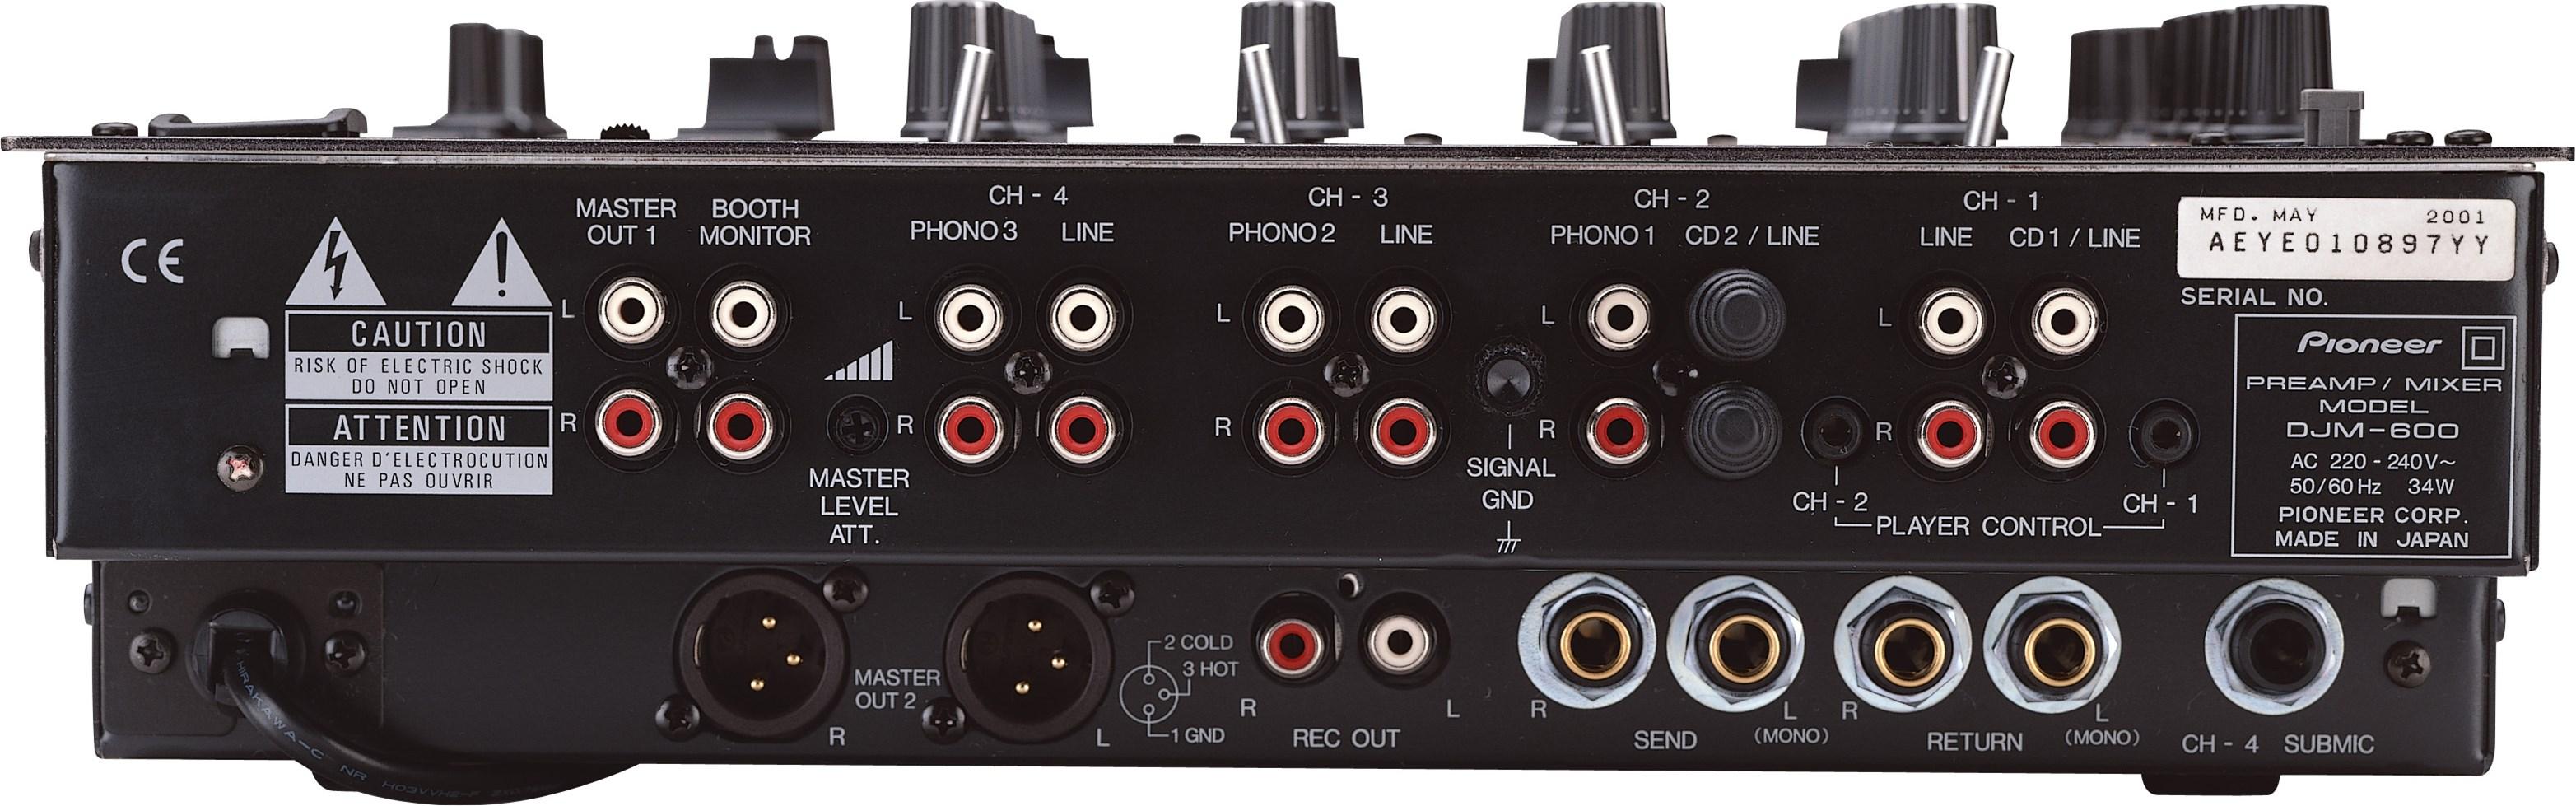 DJM-600 back